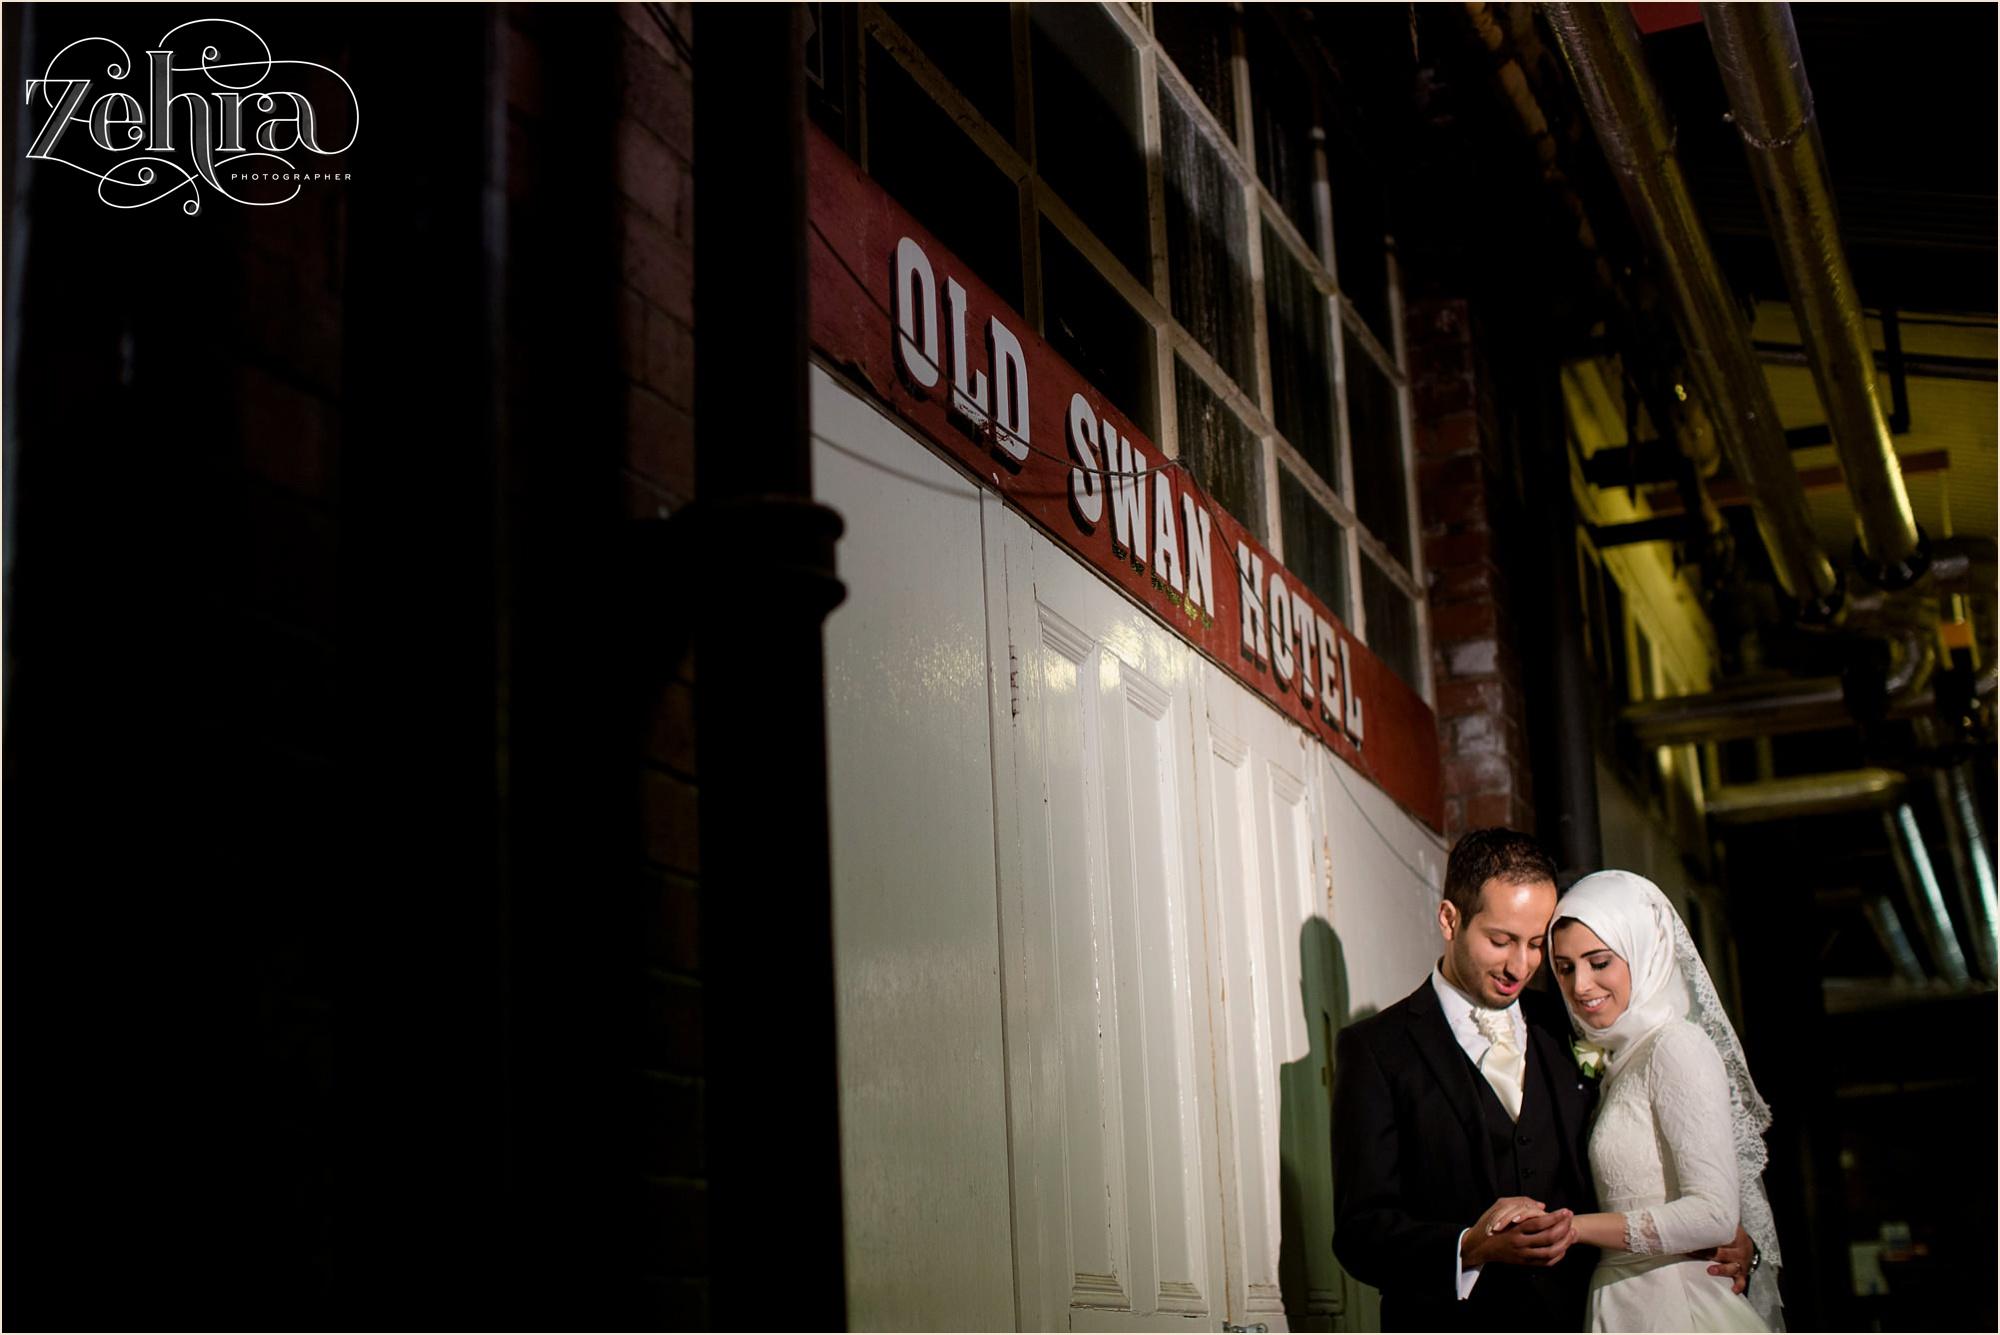 jasira manchester wedding photographer_0088.jpg